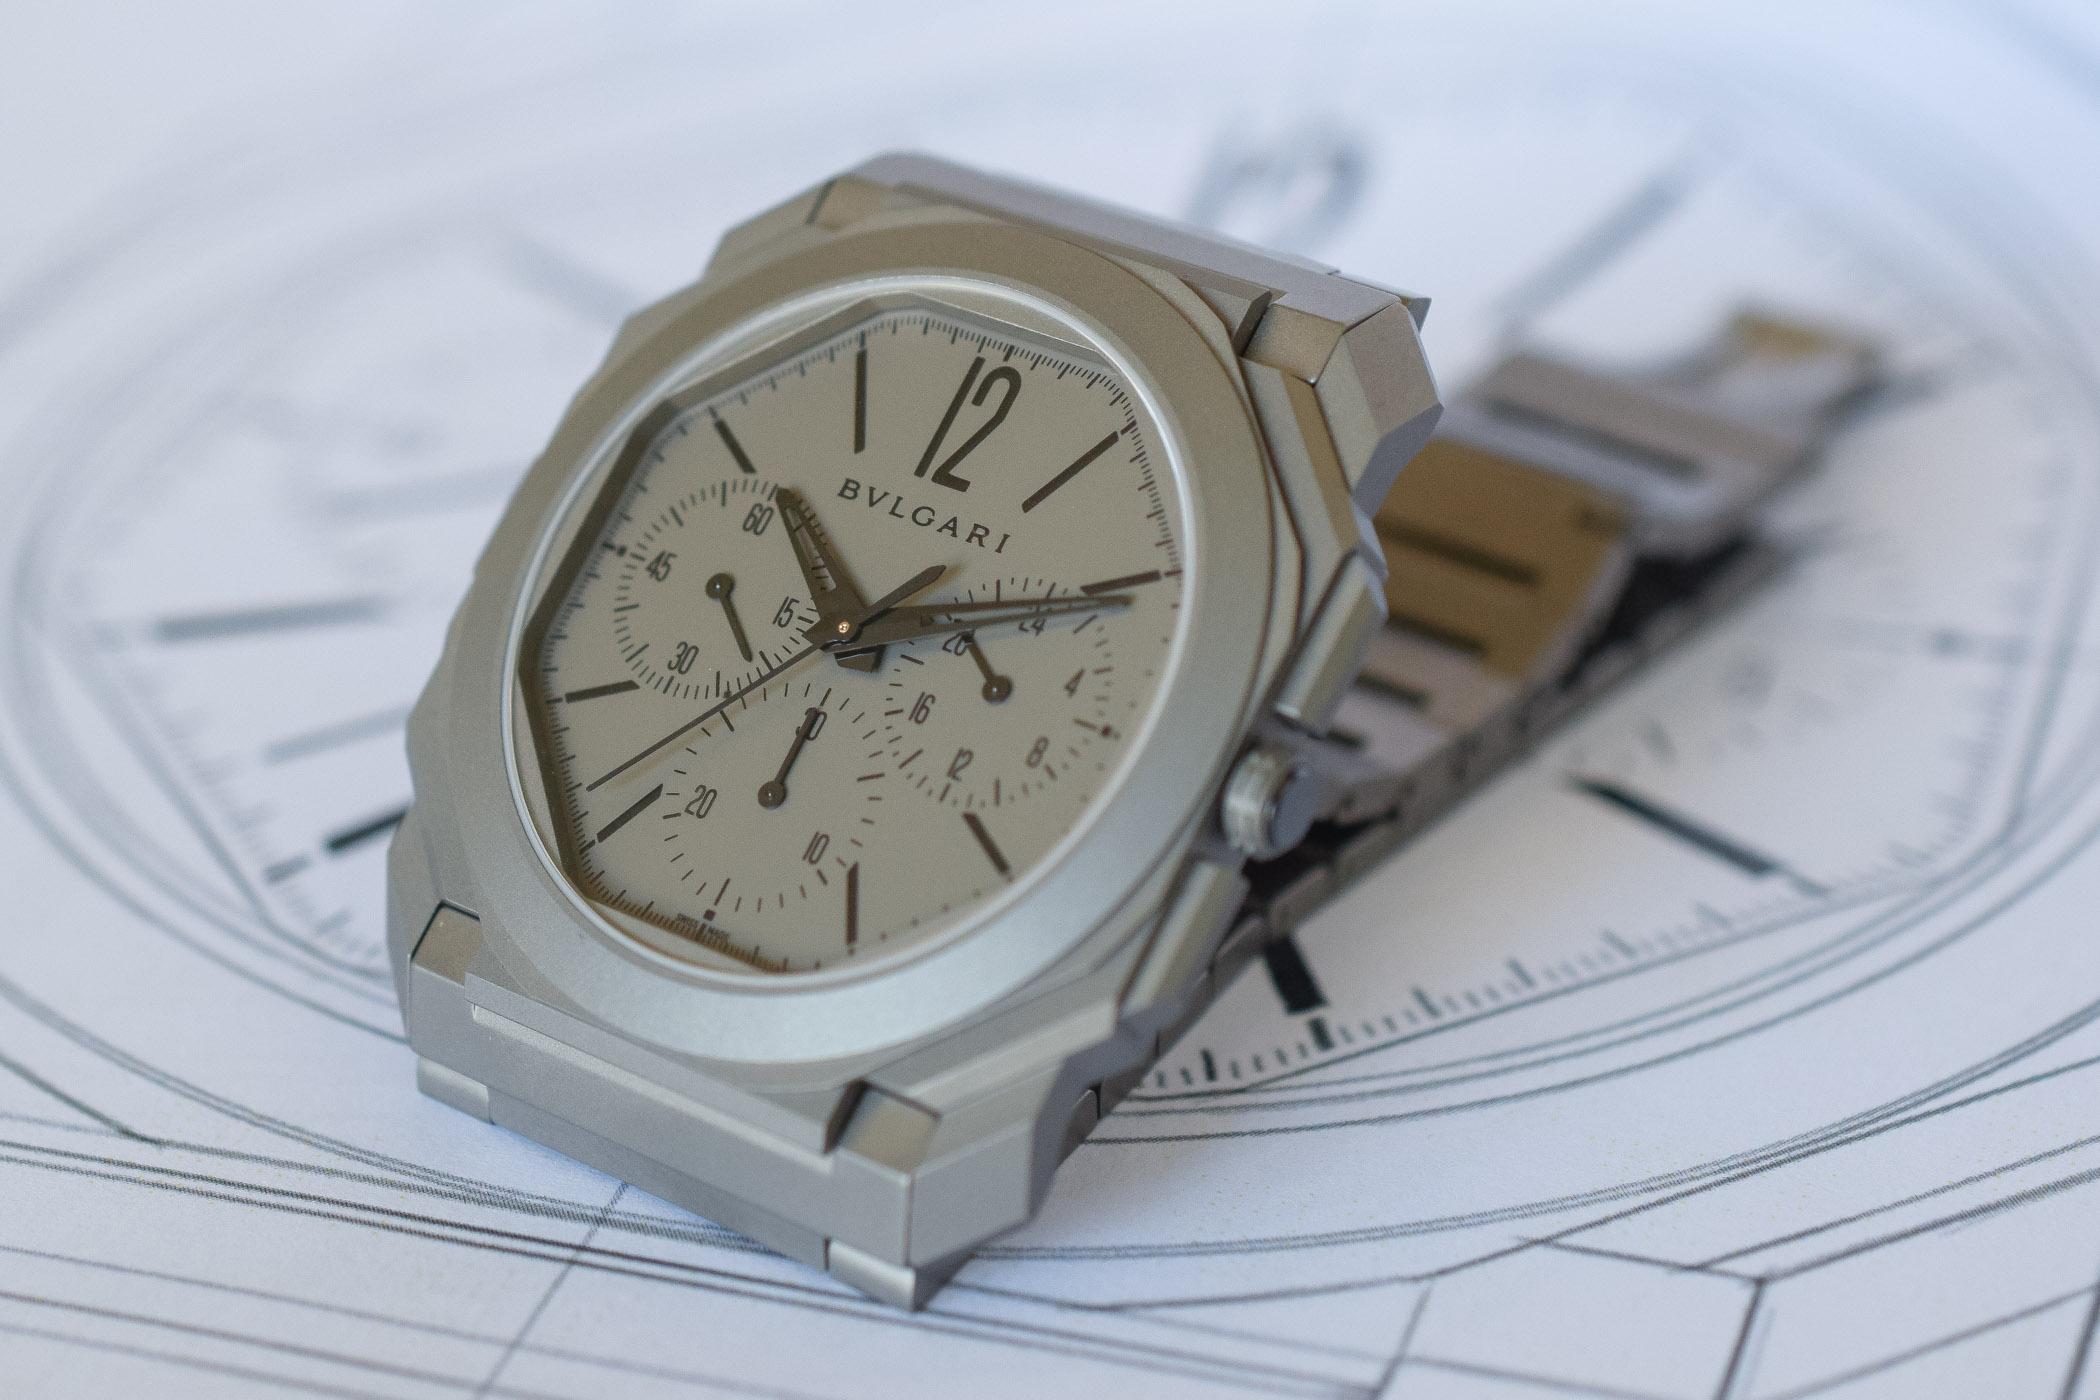 Bulgari Octo Finissimo Chronograph GMT Automatic - Worlds thinnest chronograph - Baselworld 2019